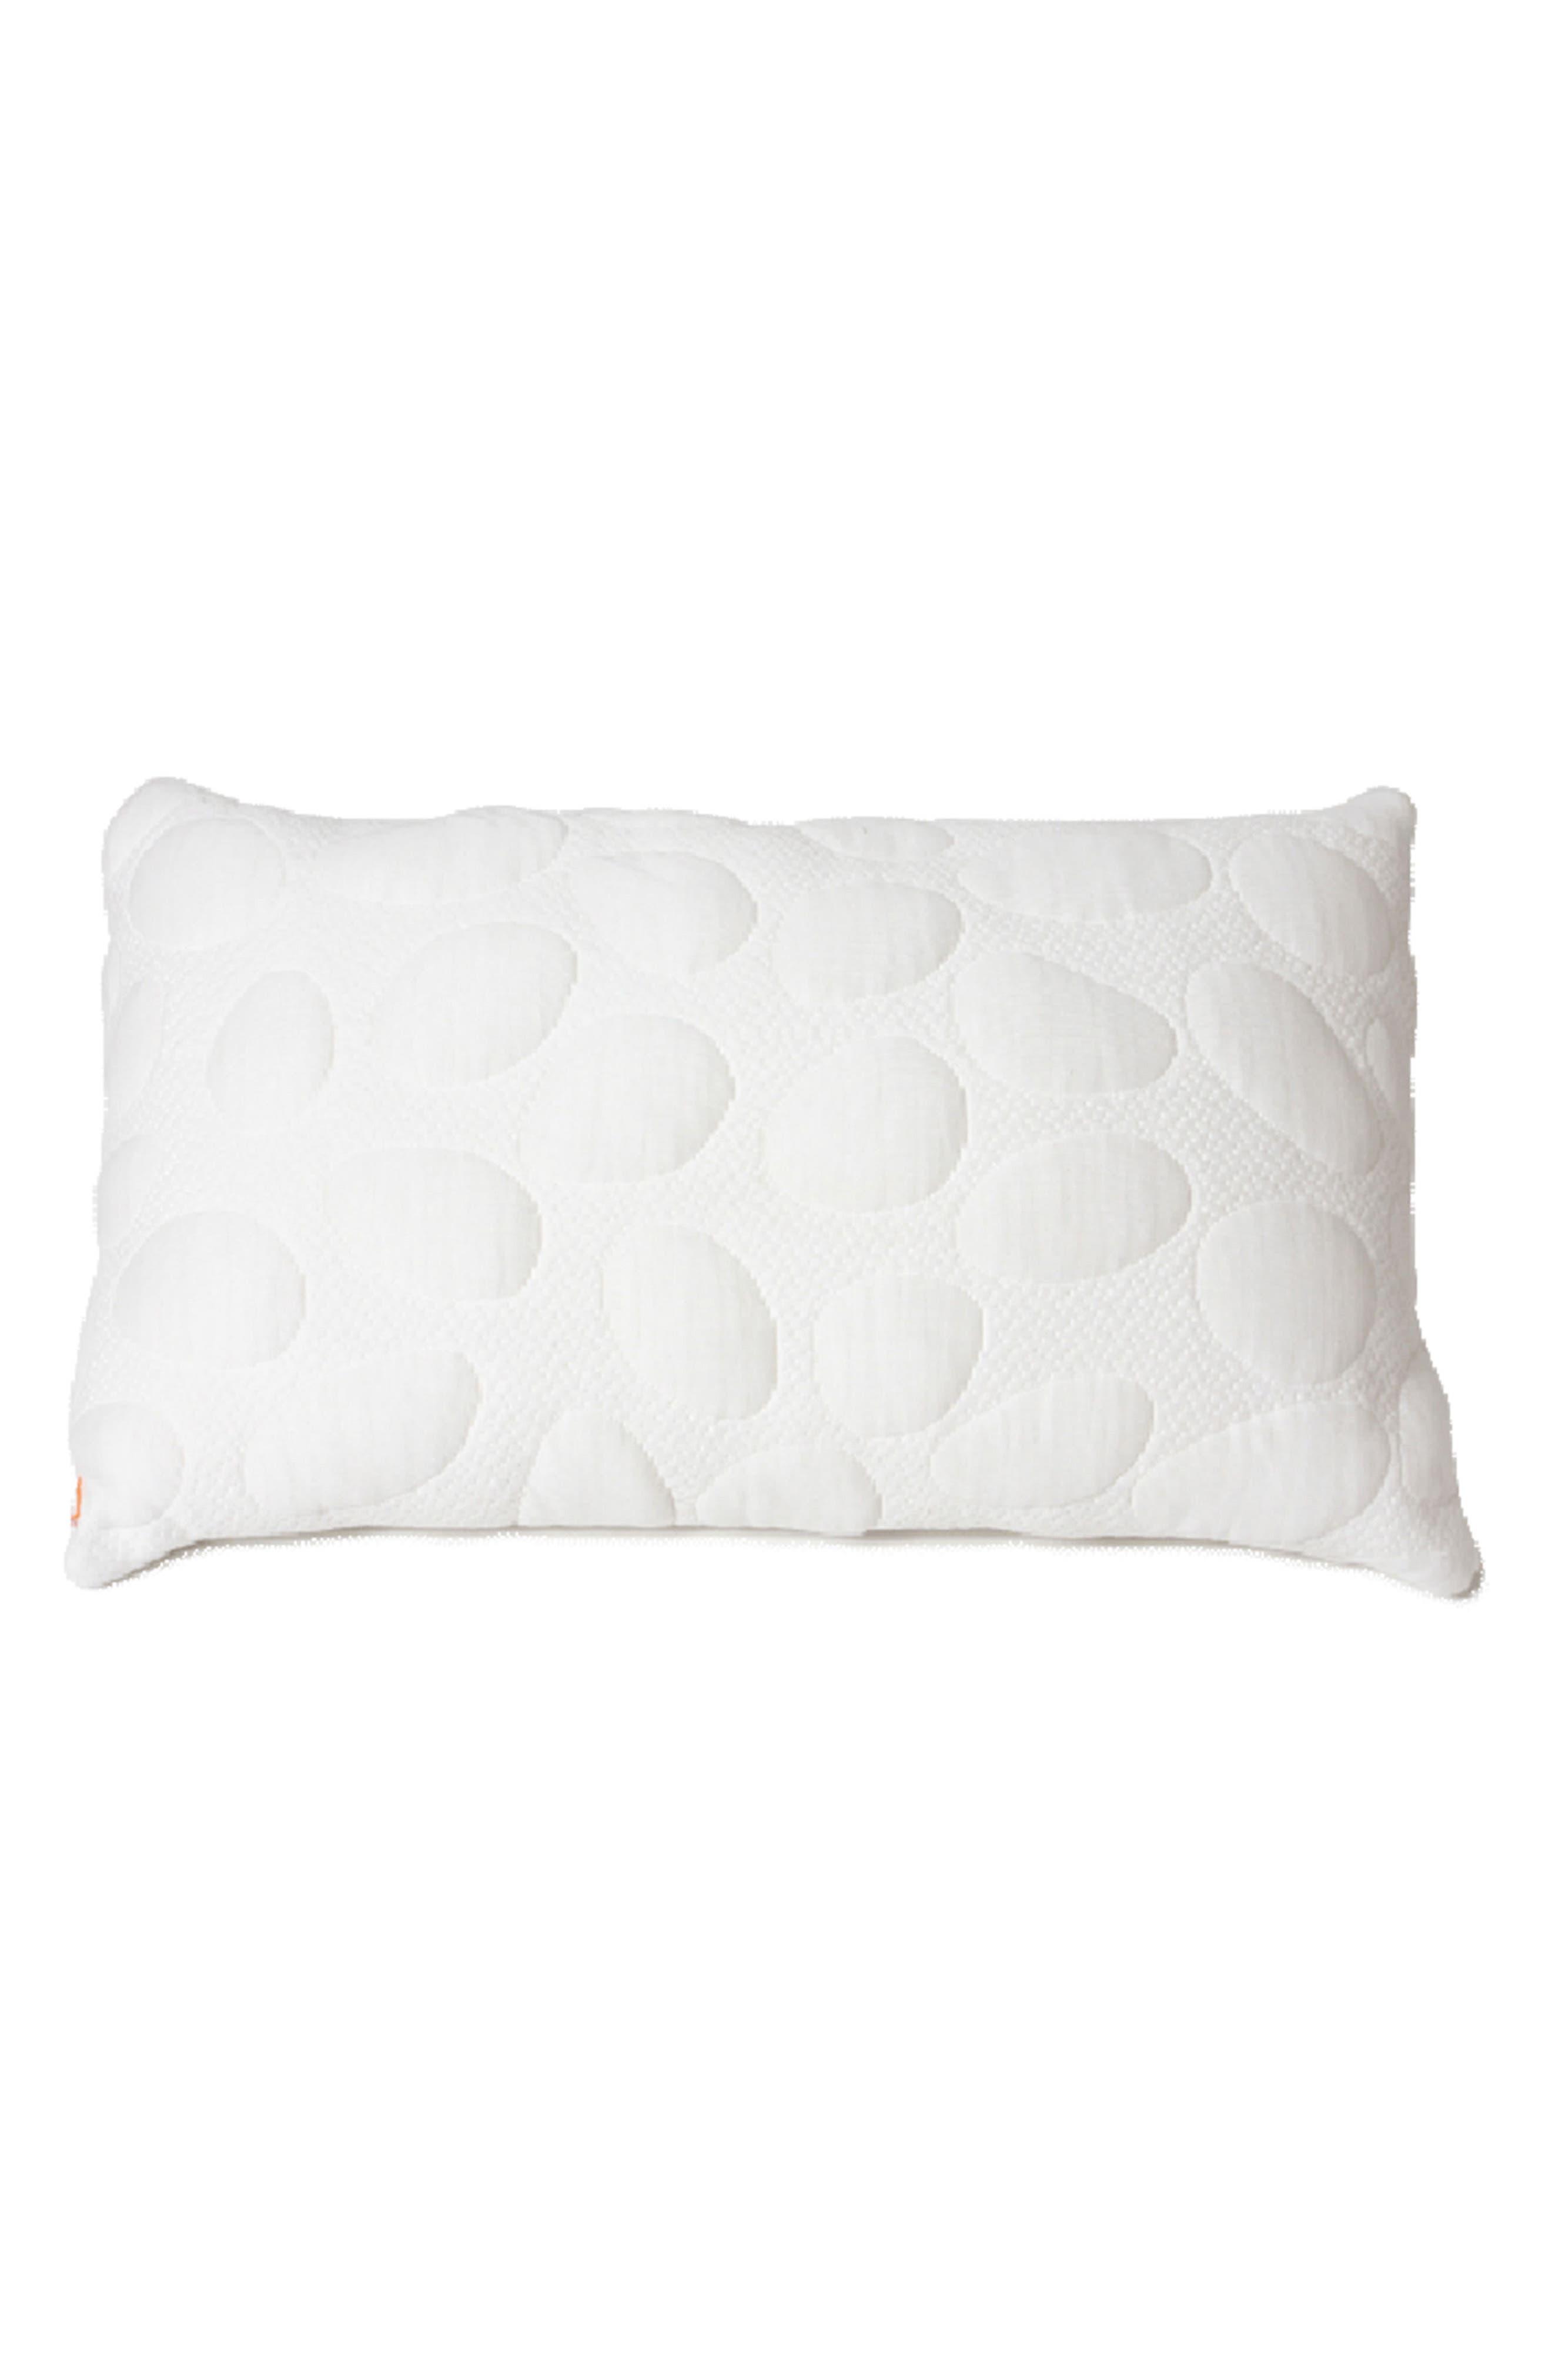 Main Image - Nook Pebble Jr. Pillow